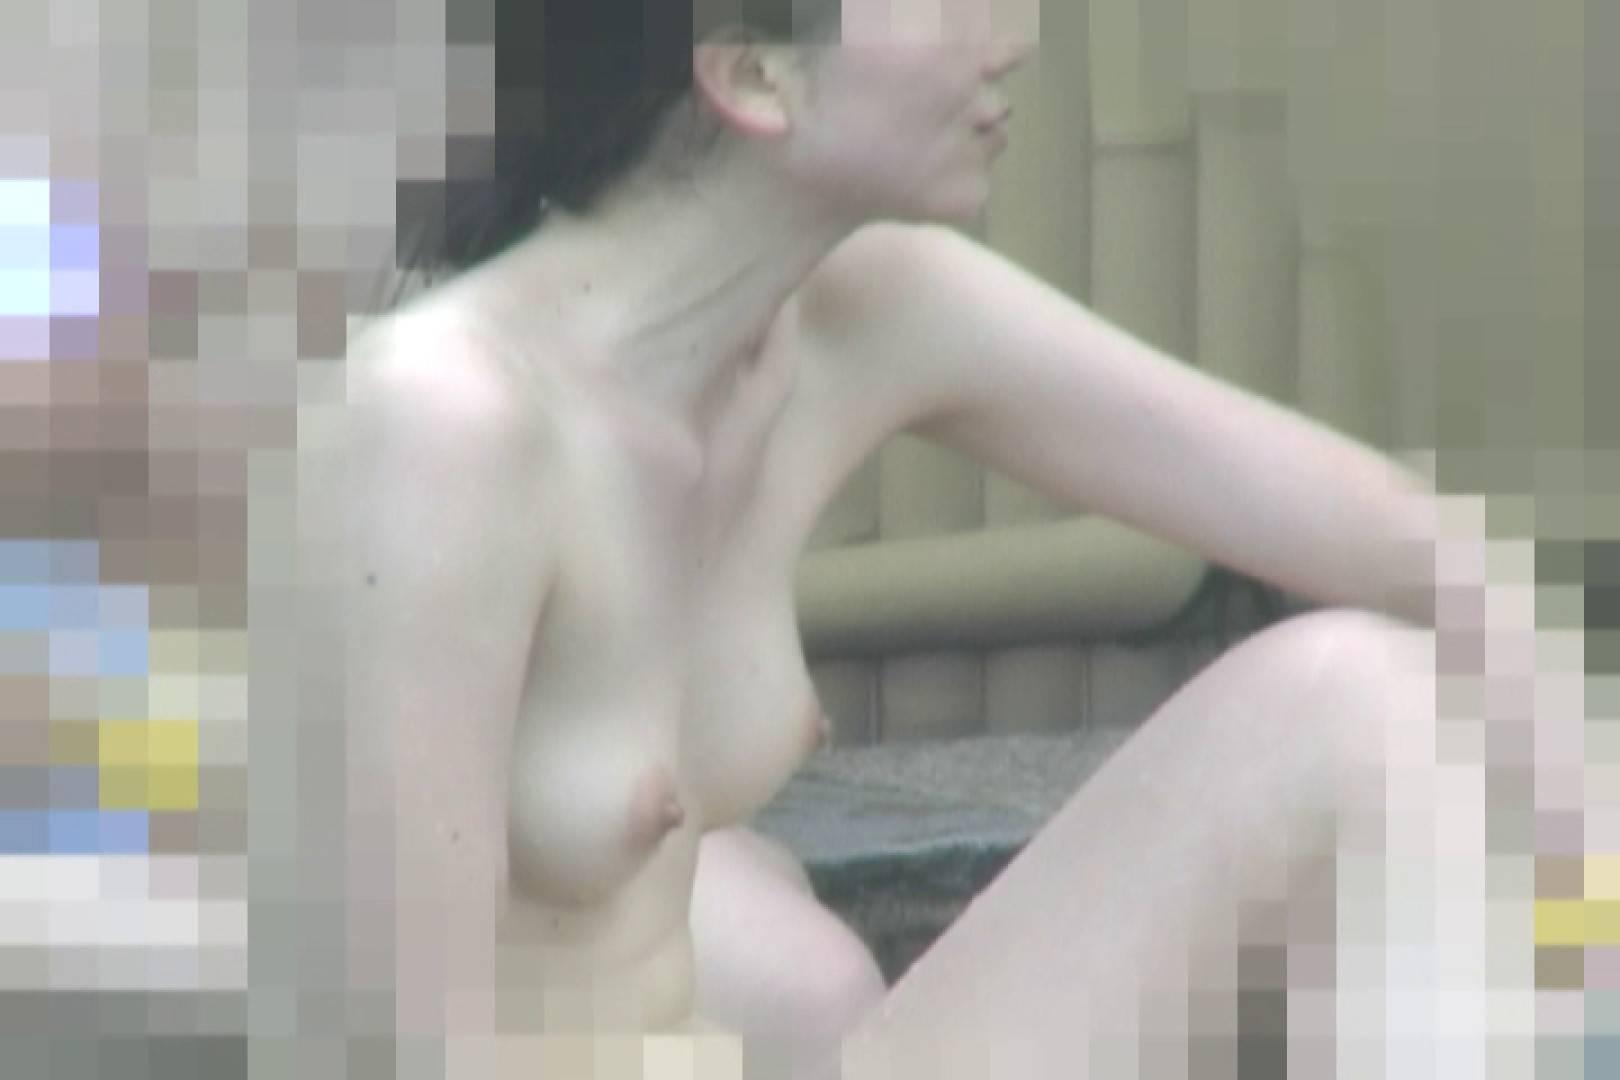 Aquaな露天風呂Vol.835 盗撮シリーズ   露天風呂編  92PIX 77